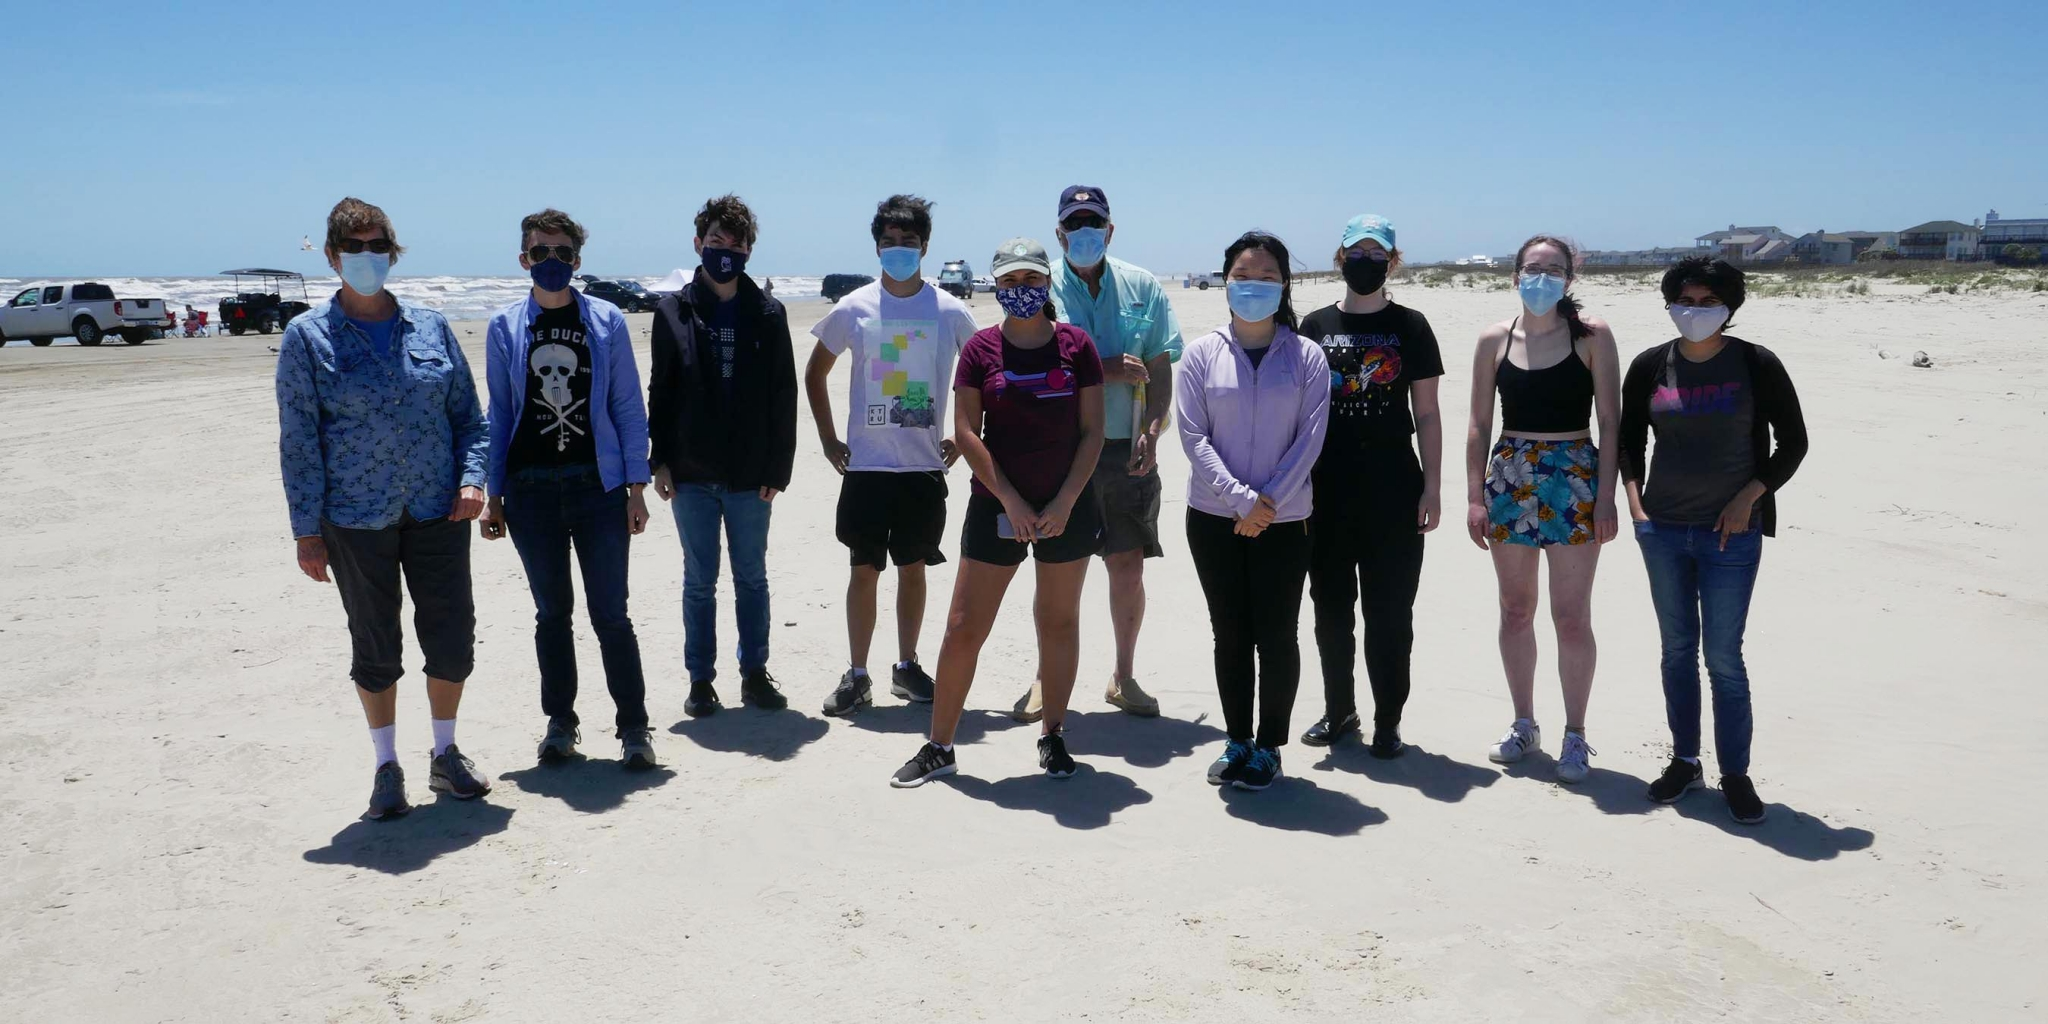 RUGS Field Trip to Galveston Island and the Upper Texas Gulf Coast